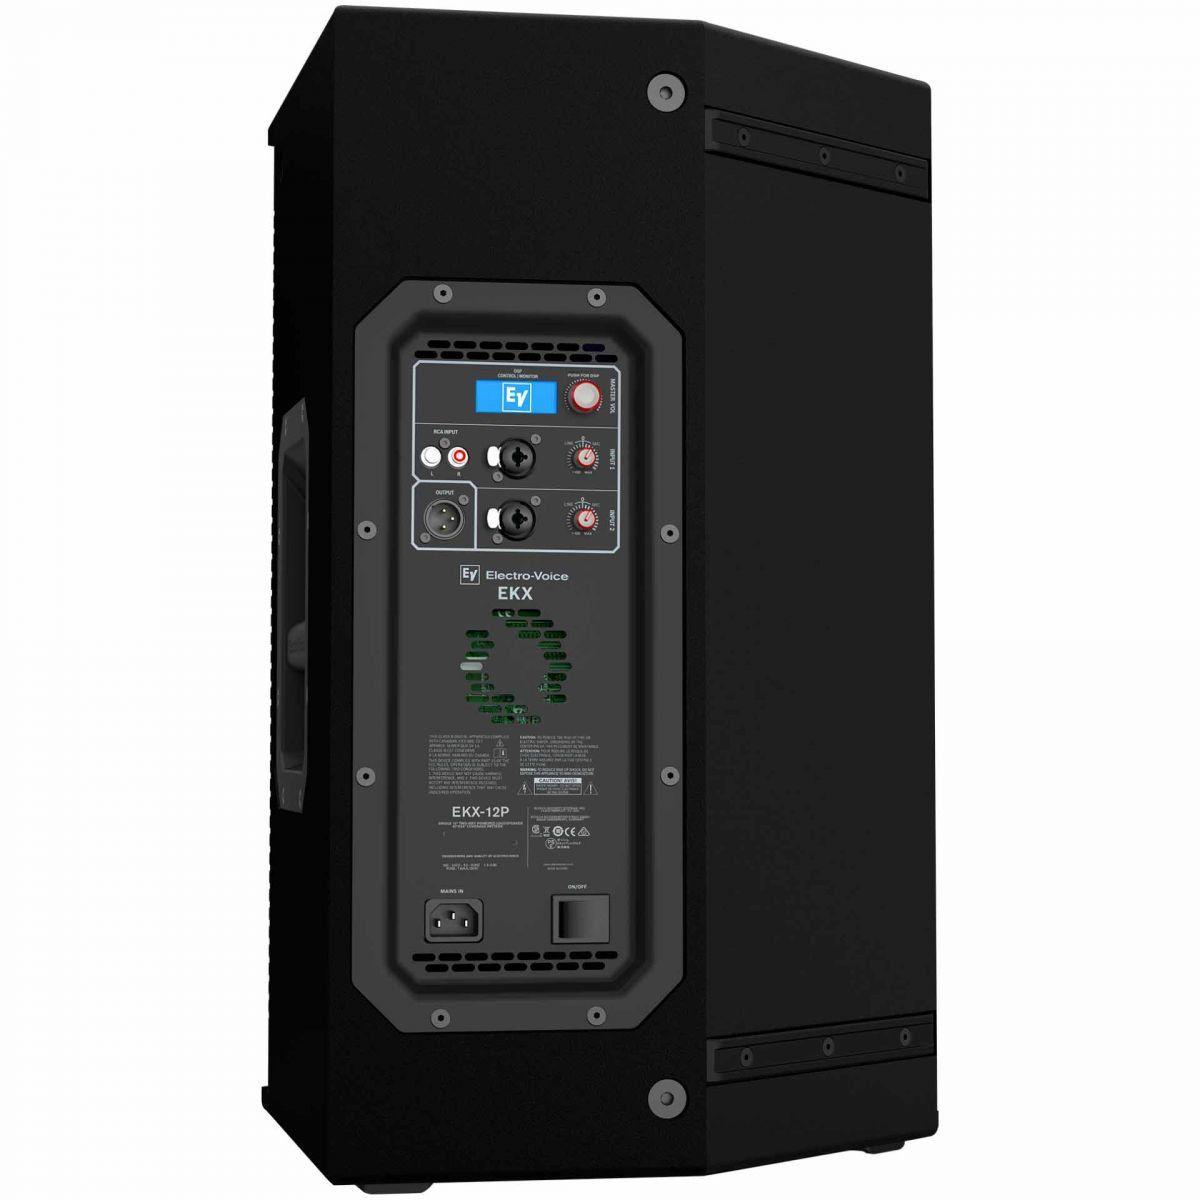 Caixa Ativa Fal 12 Pol 1500W - EKX 12P US Electro-Voice